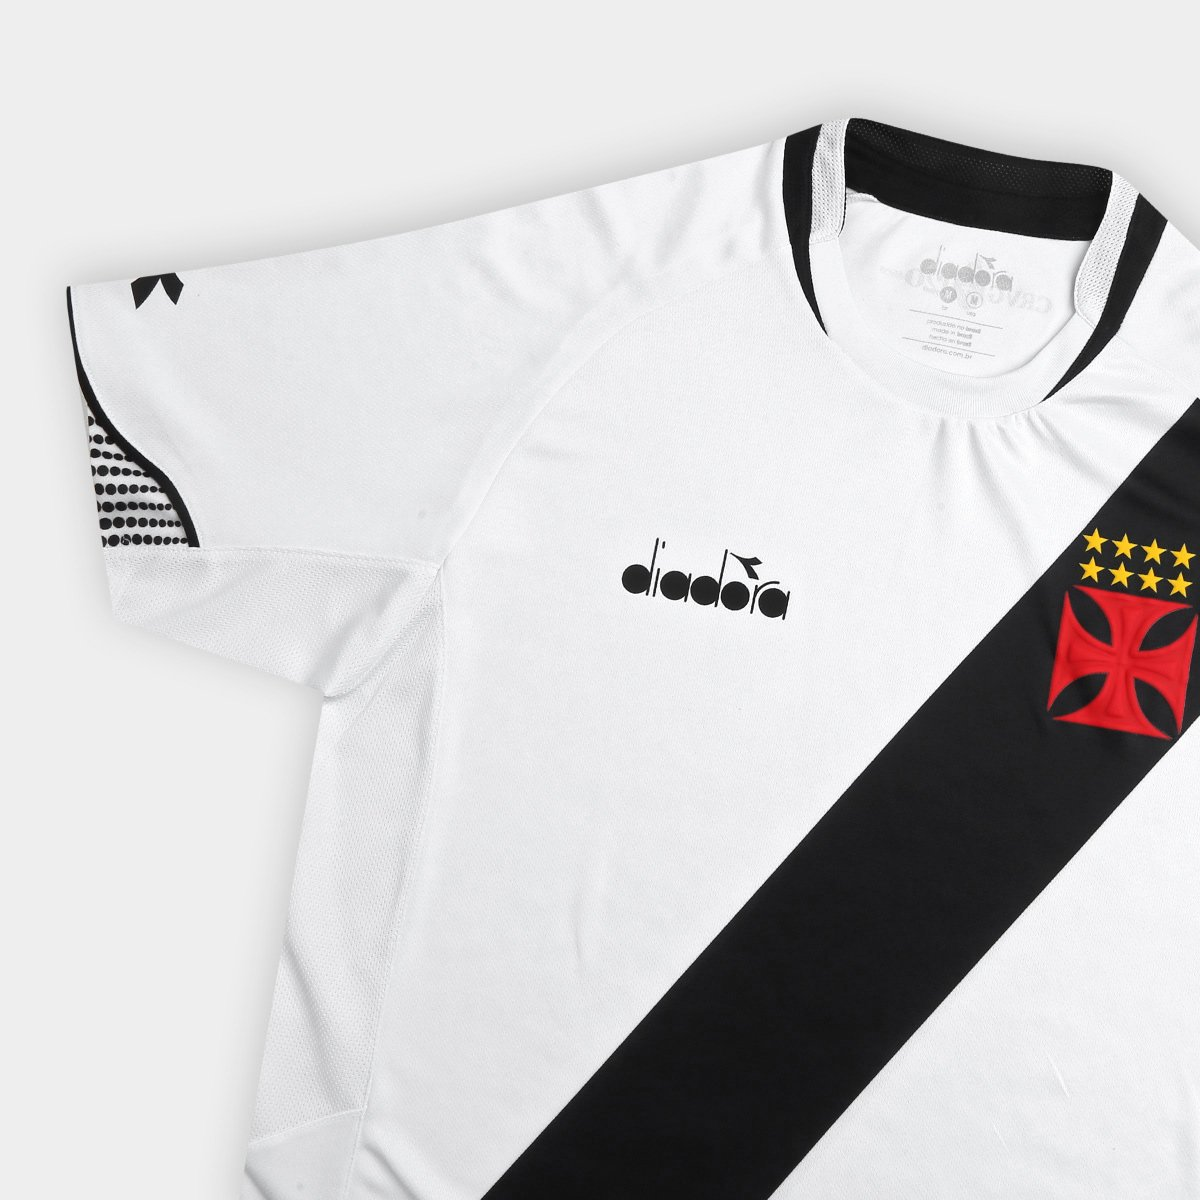 Camisa Vasco II 2018 s n° Jogador Diadora Masculina - Branco ... c8043c39f07f9